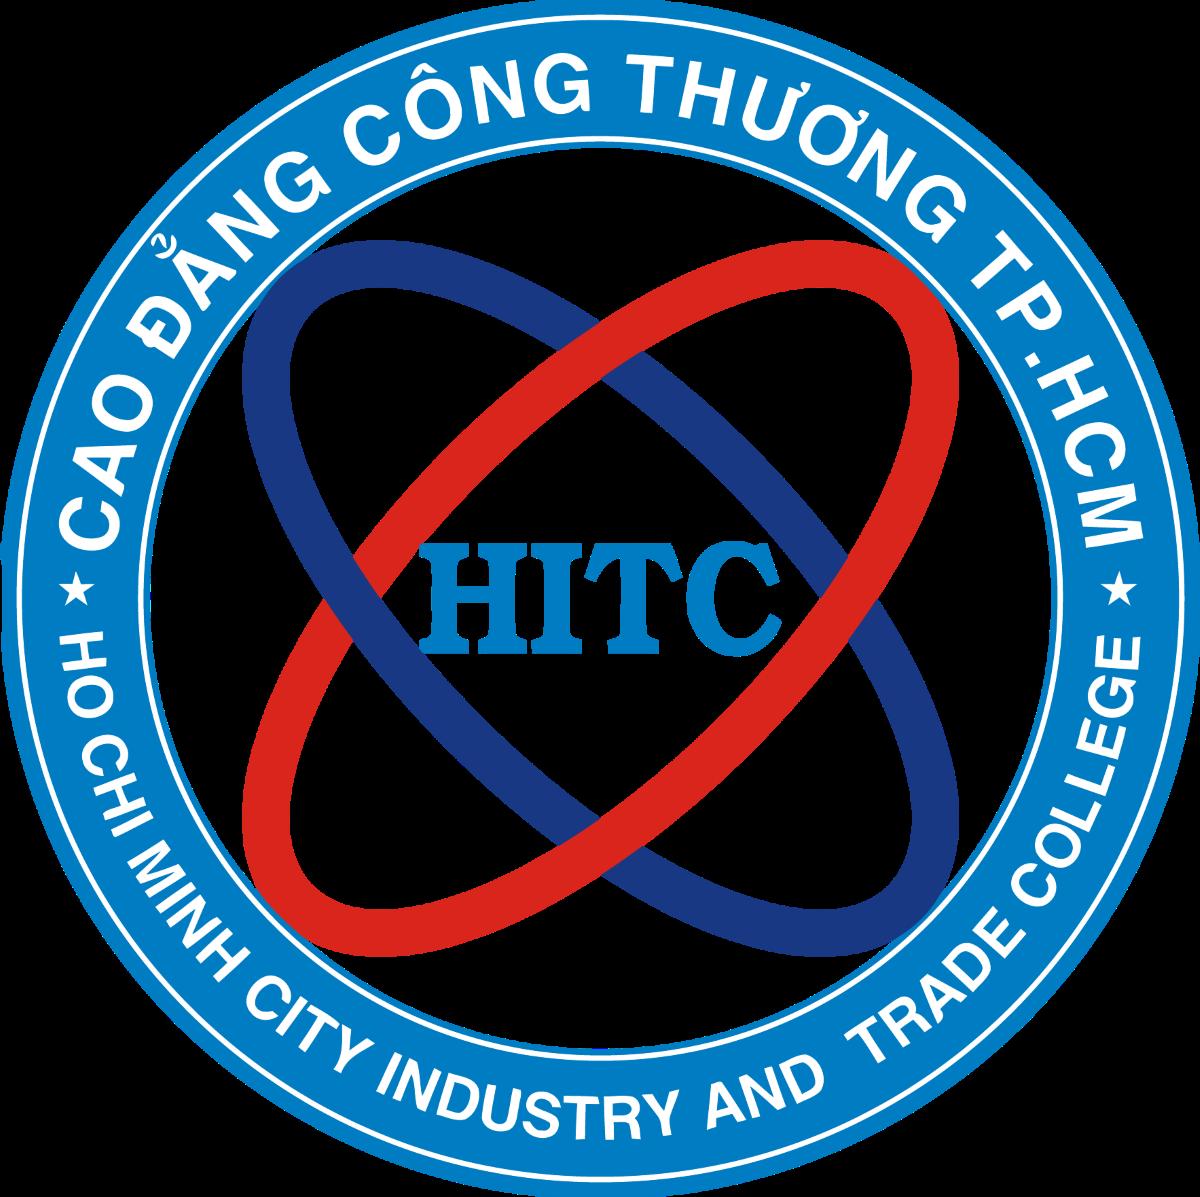 Logo CD Cong Thuong TpHCM HITU